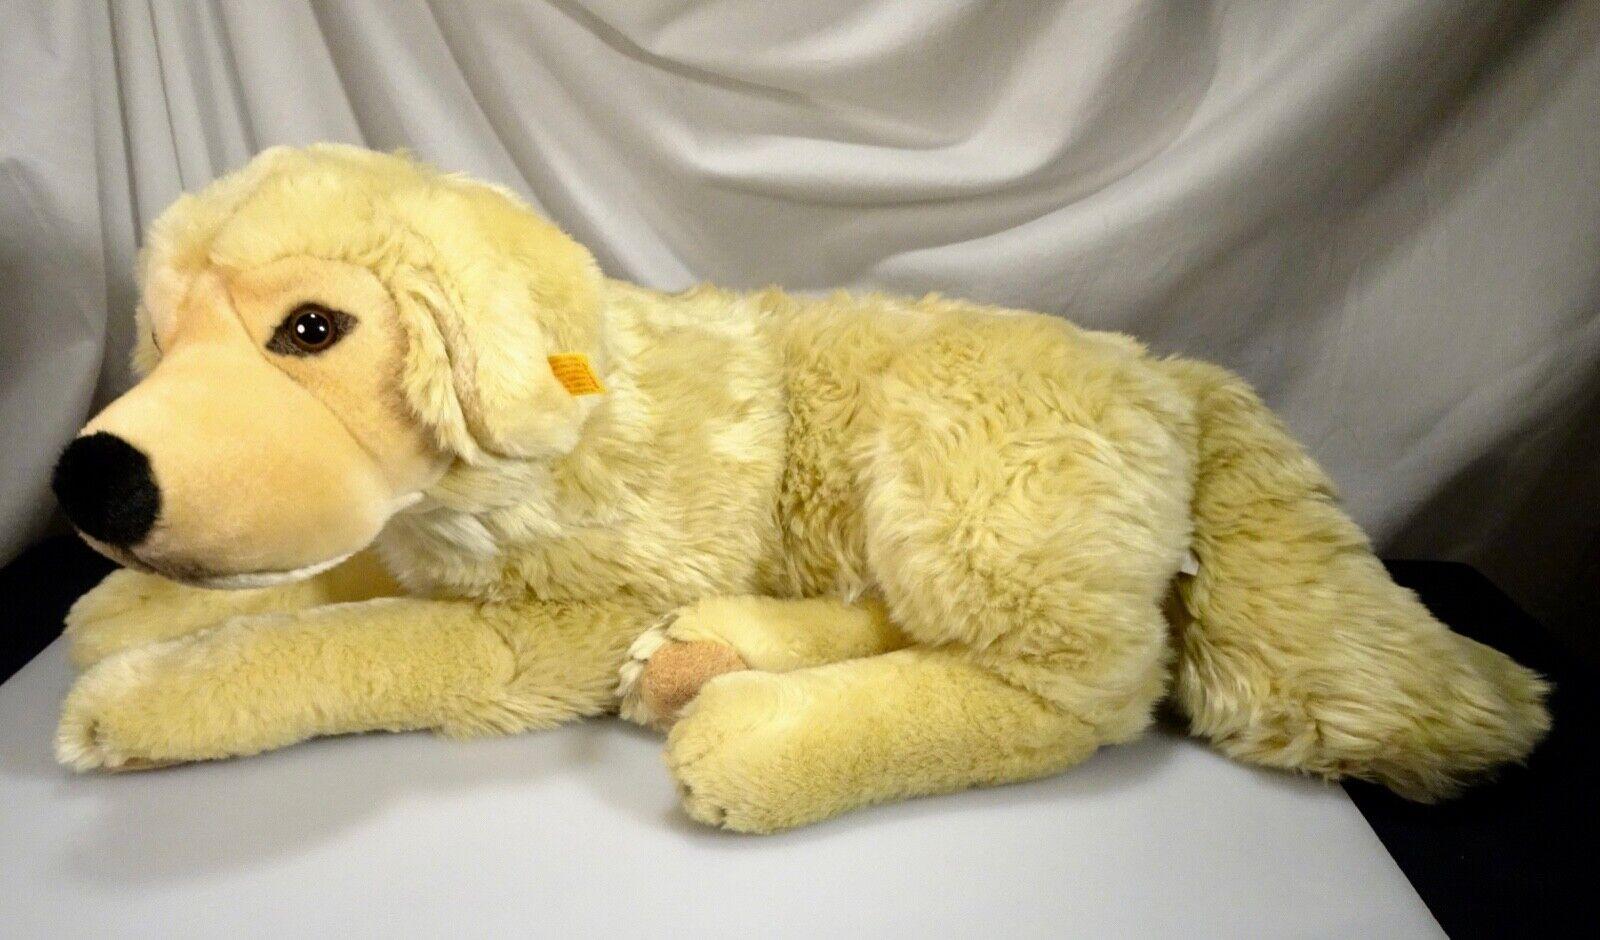 Steiff Groß Golden Retriever Plüschtier Hund 19   Neu  668838 - 56485